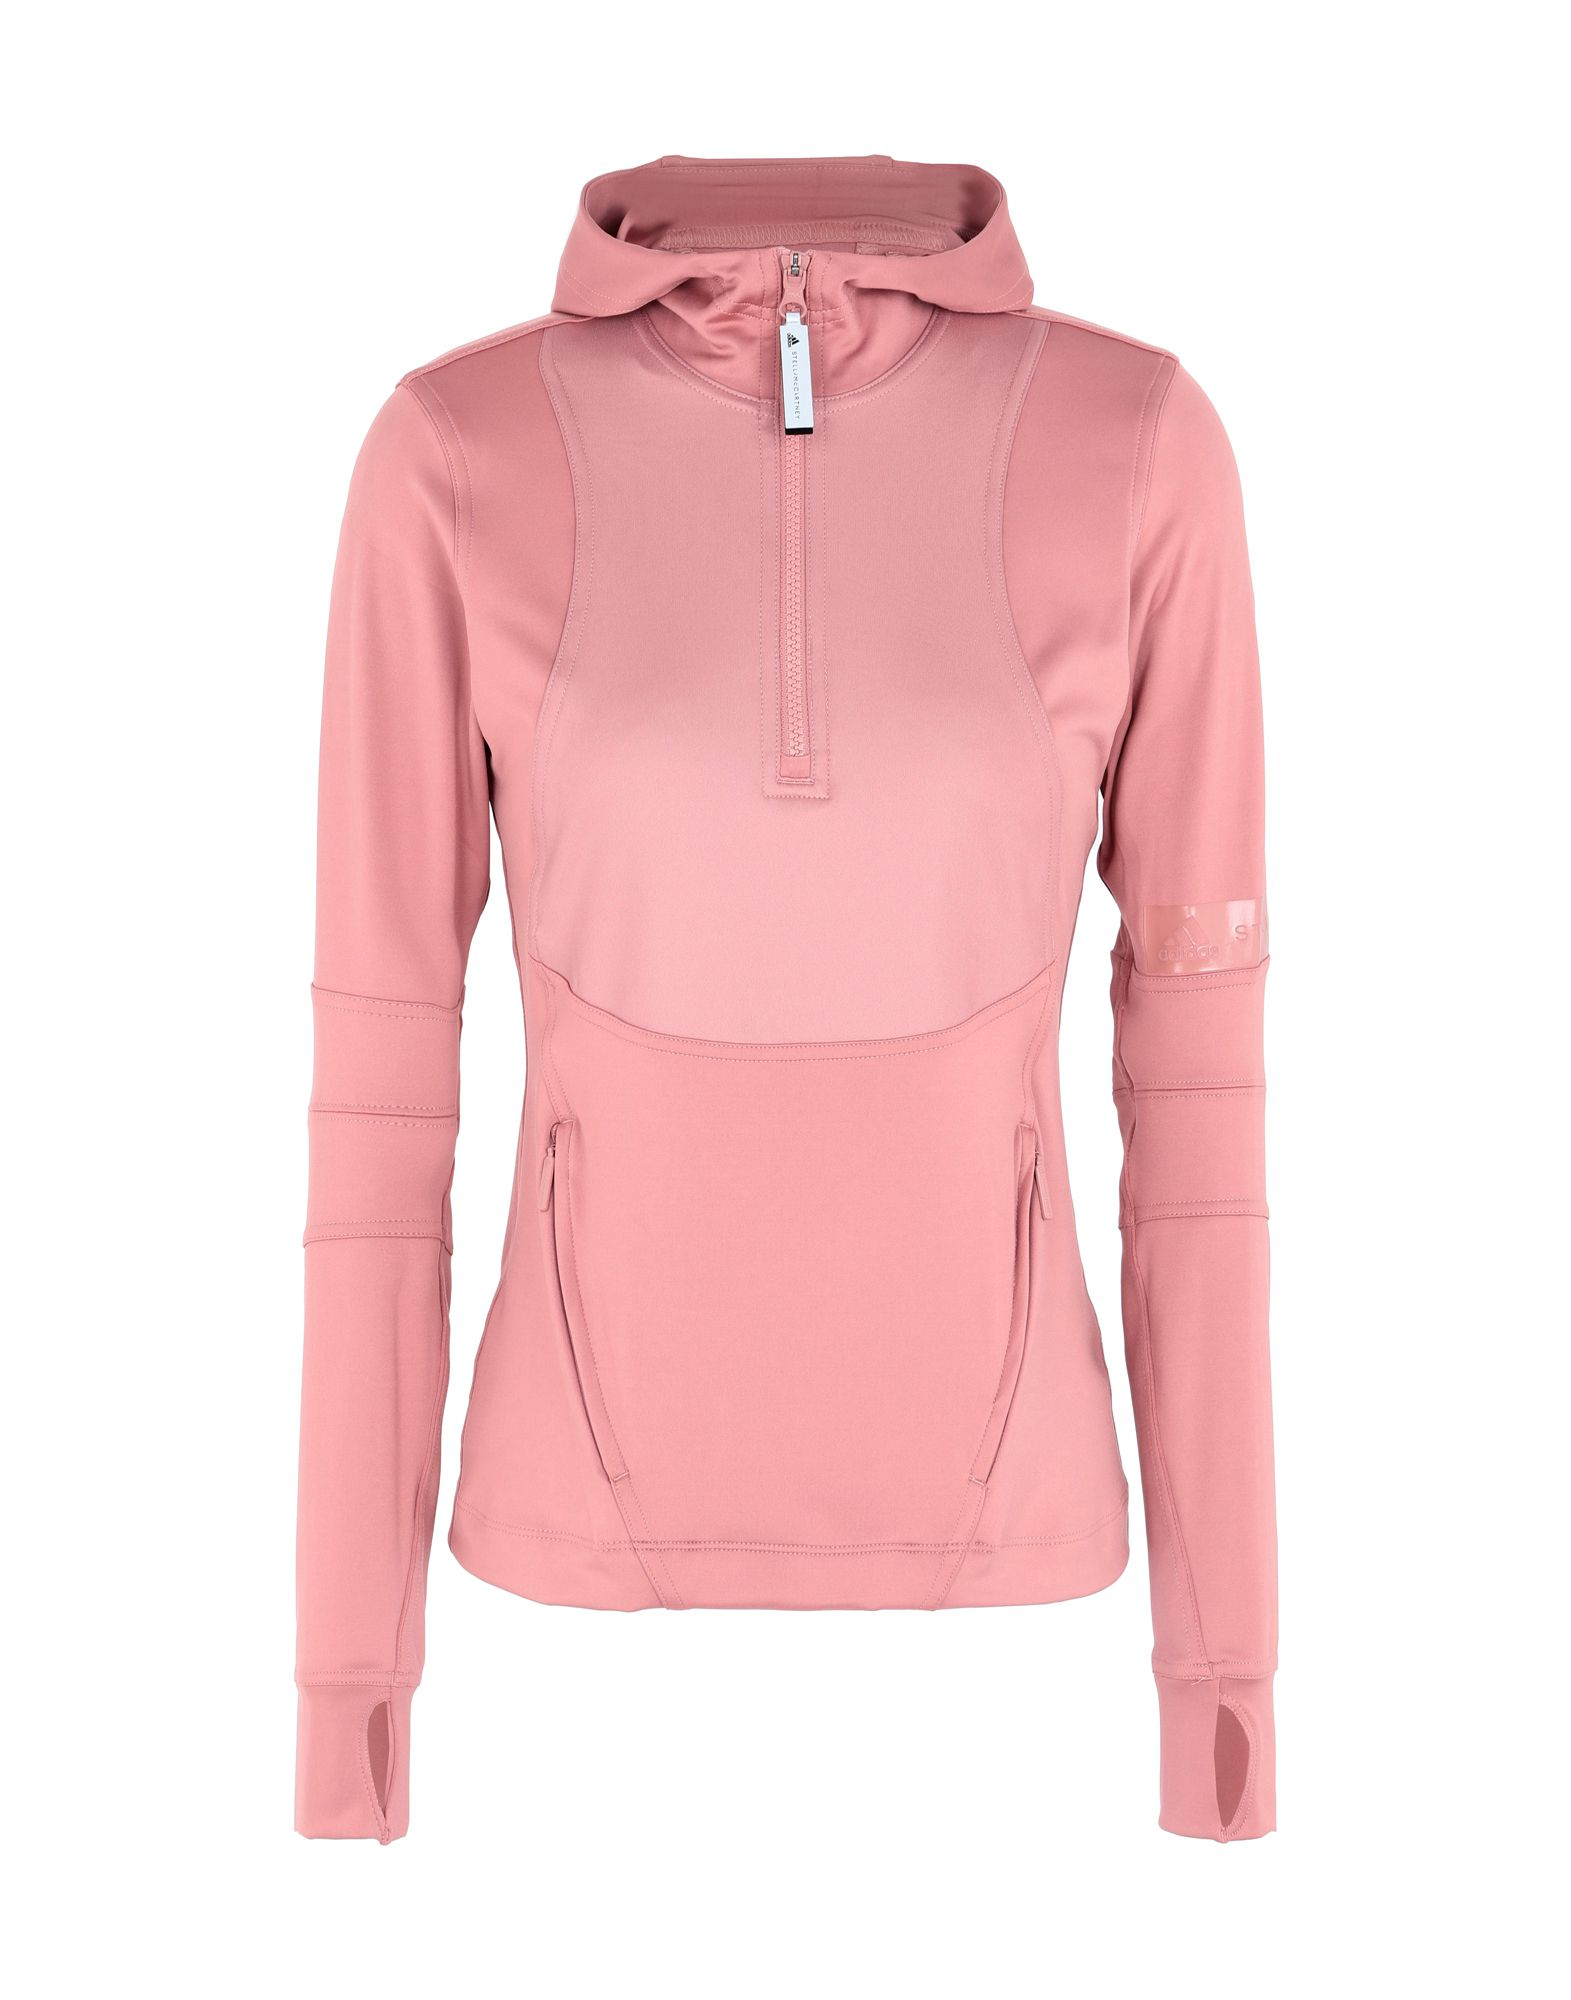 ff3a8fbbafae ADIDAS by STELLA McCARTNEY. Run Hooded Longsleeve. Hooded track jacket